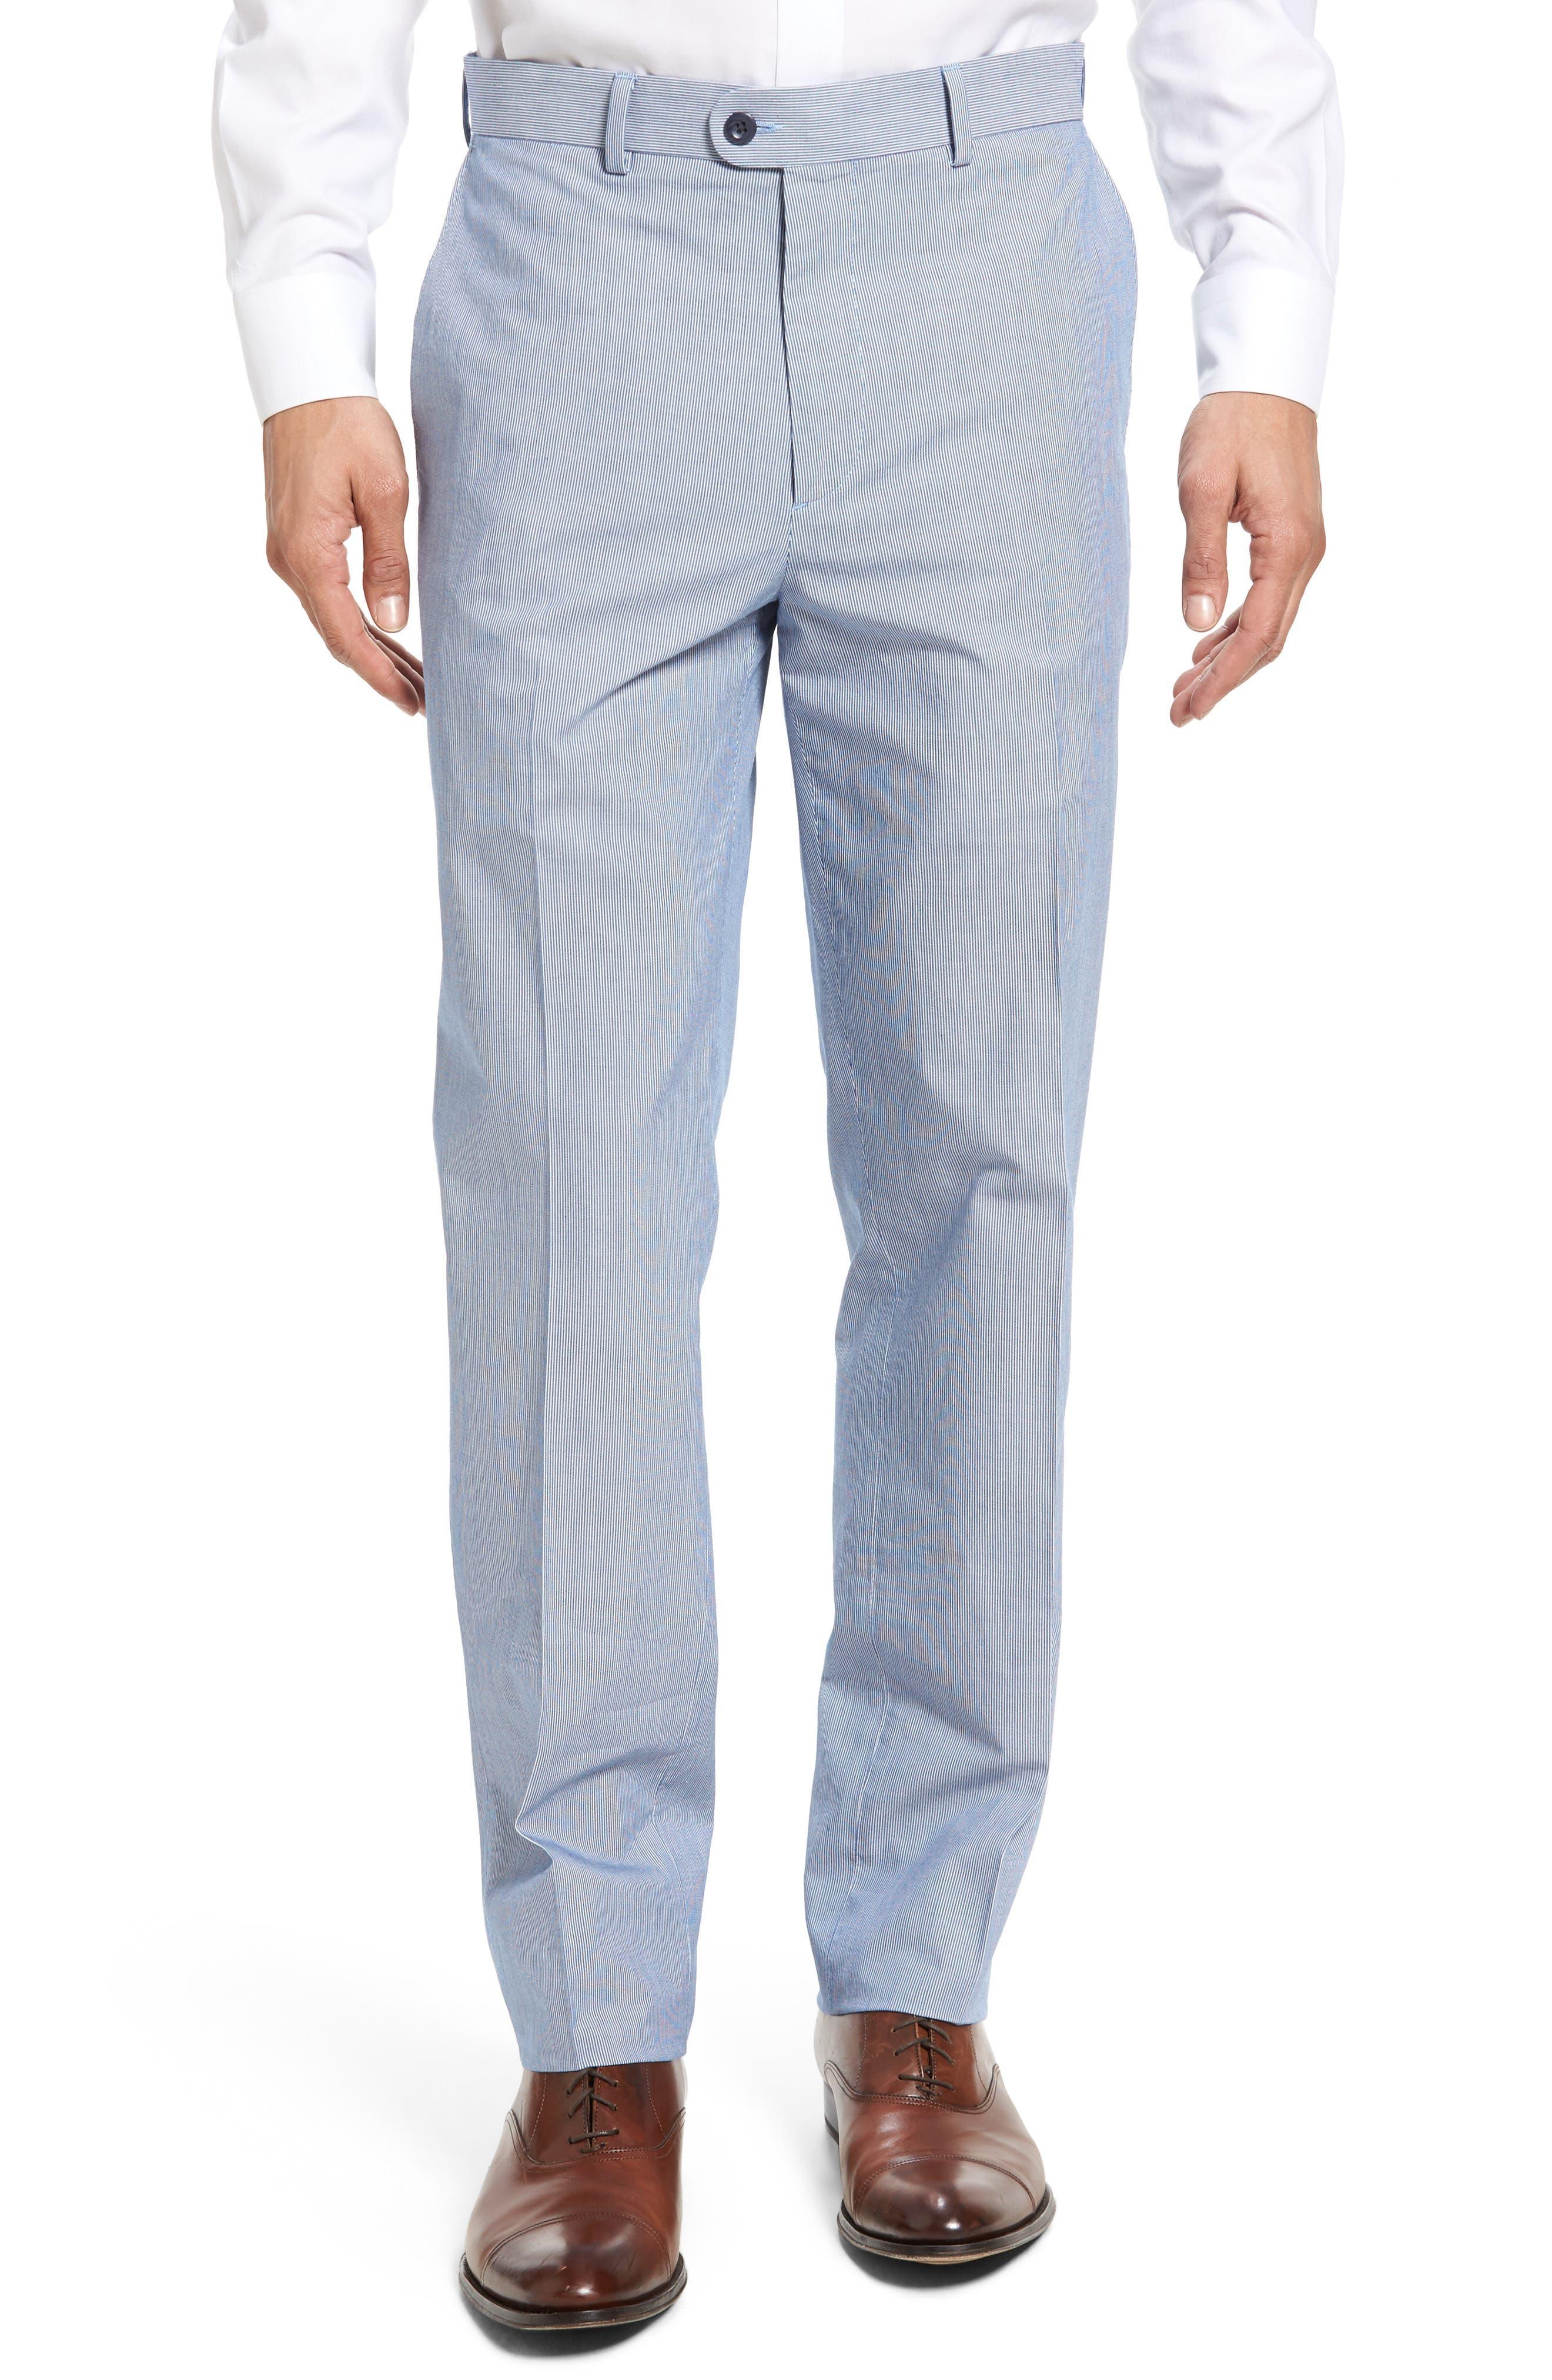 Bensol Cape Cod Trousers